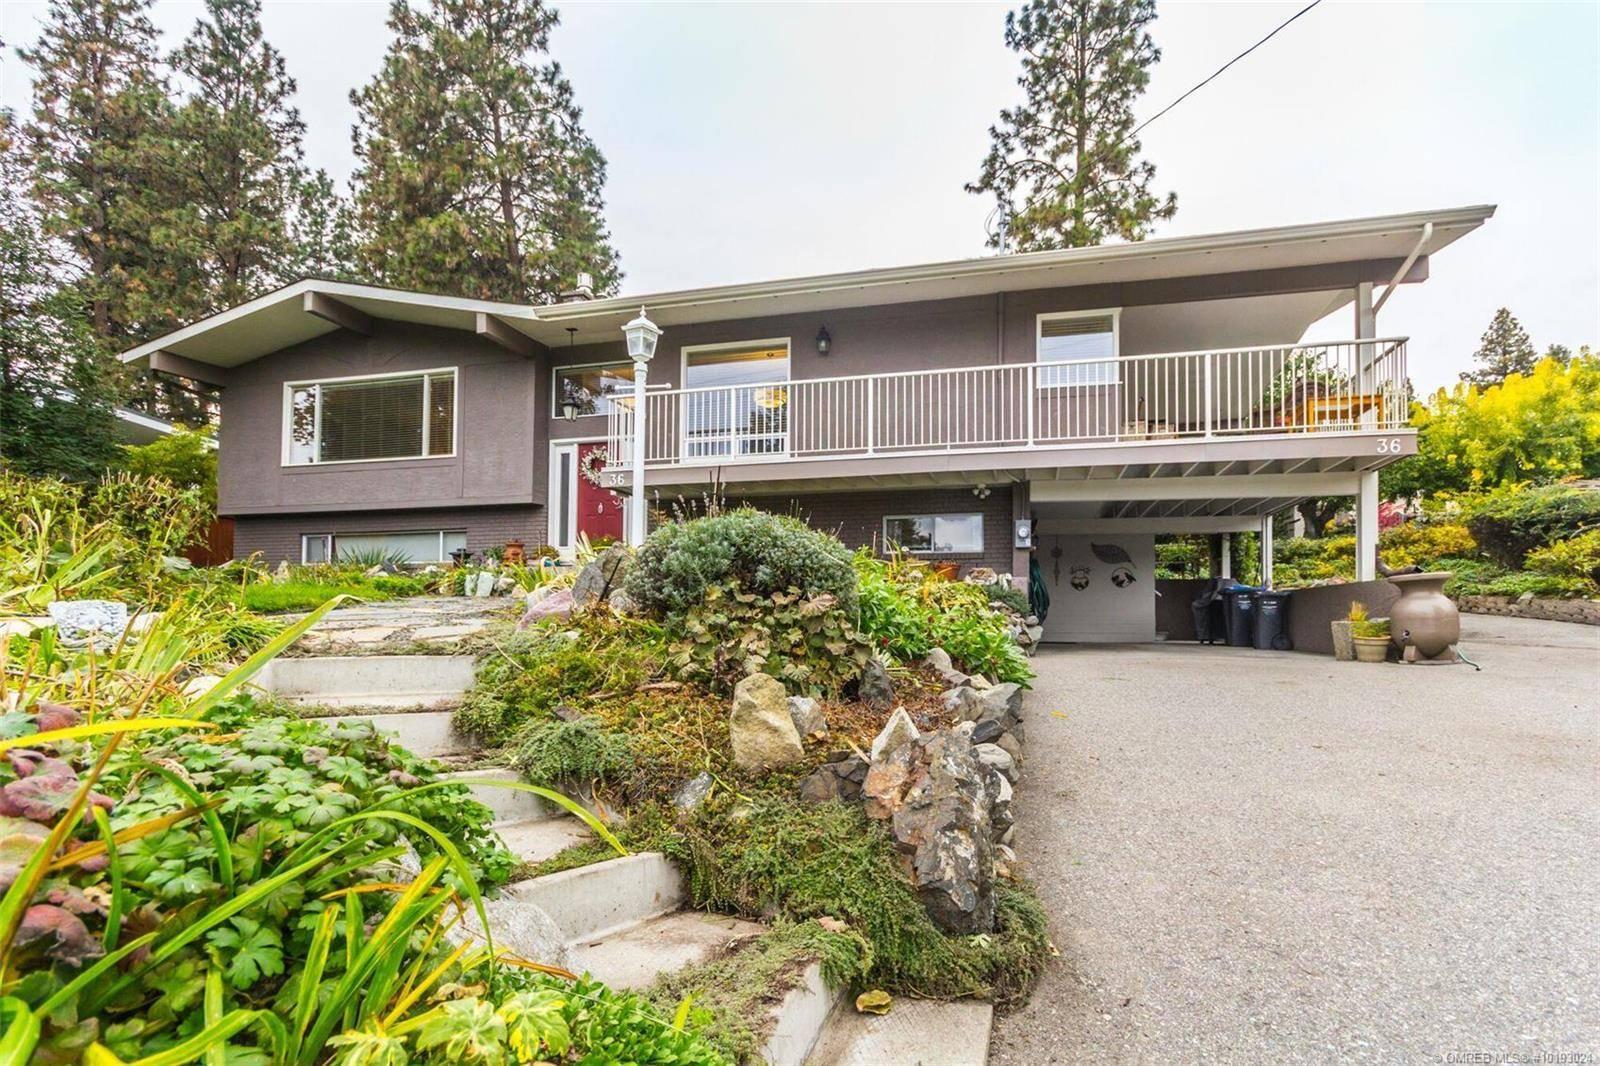 House for sale at 36 Bello Rd Kelowna British Columbia - MLS: 10193024